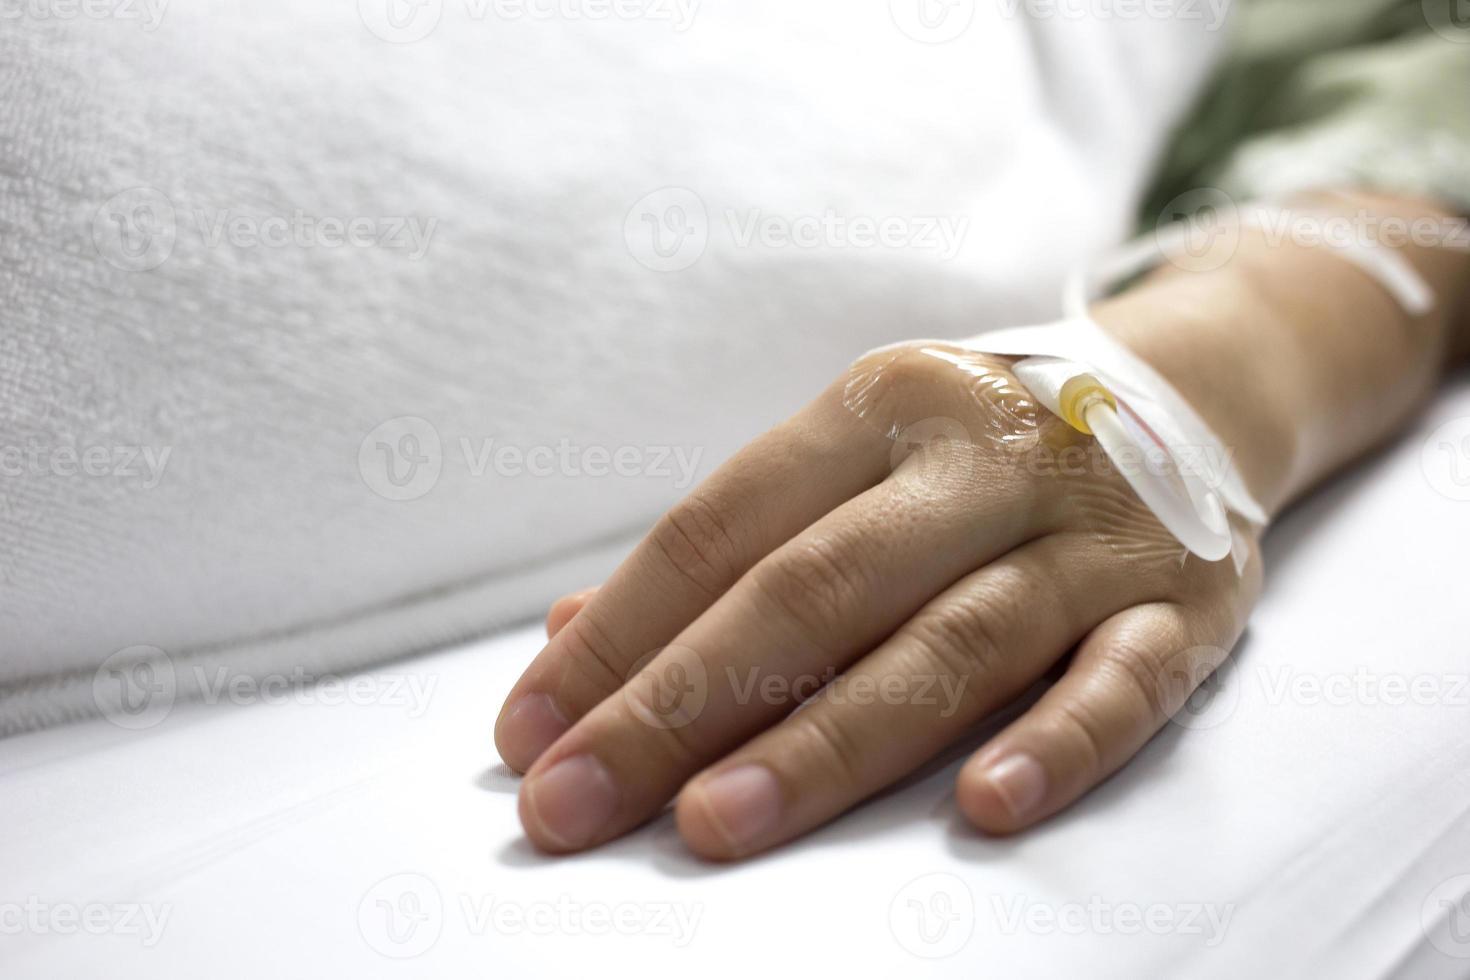 sjuk på sjukhuset. foto